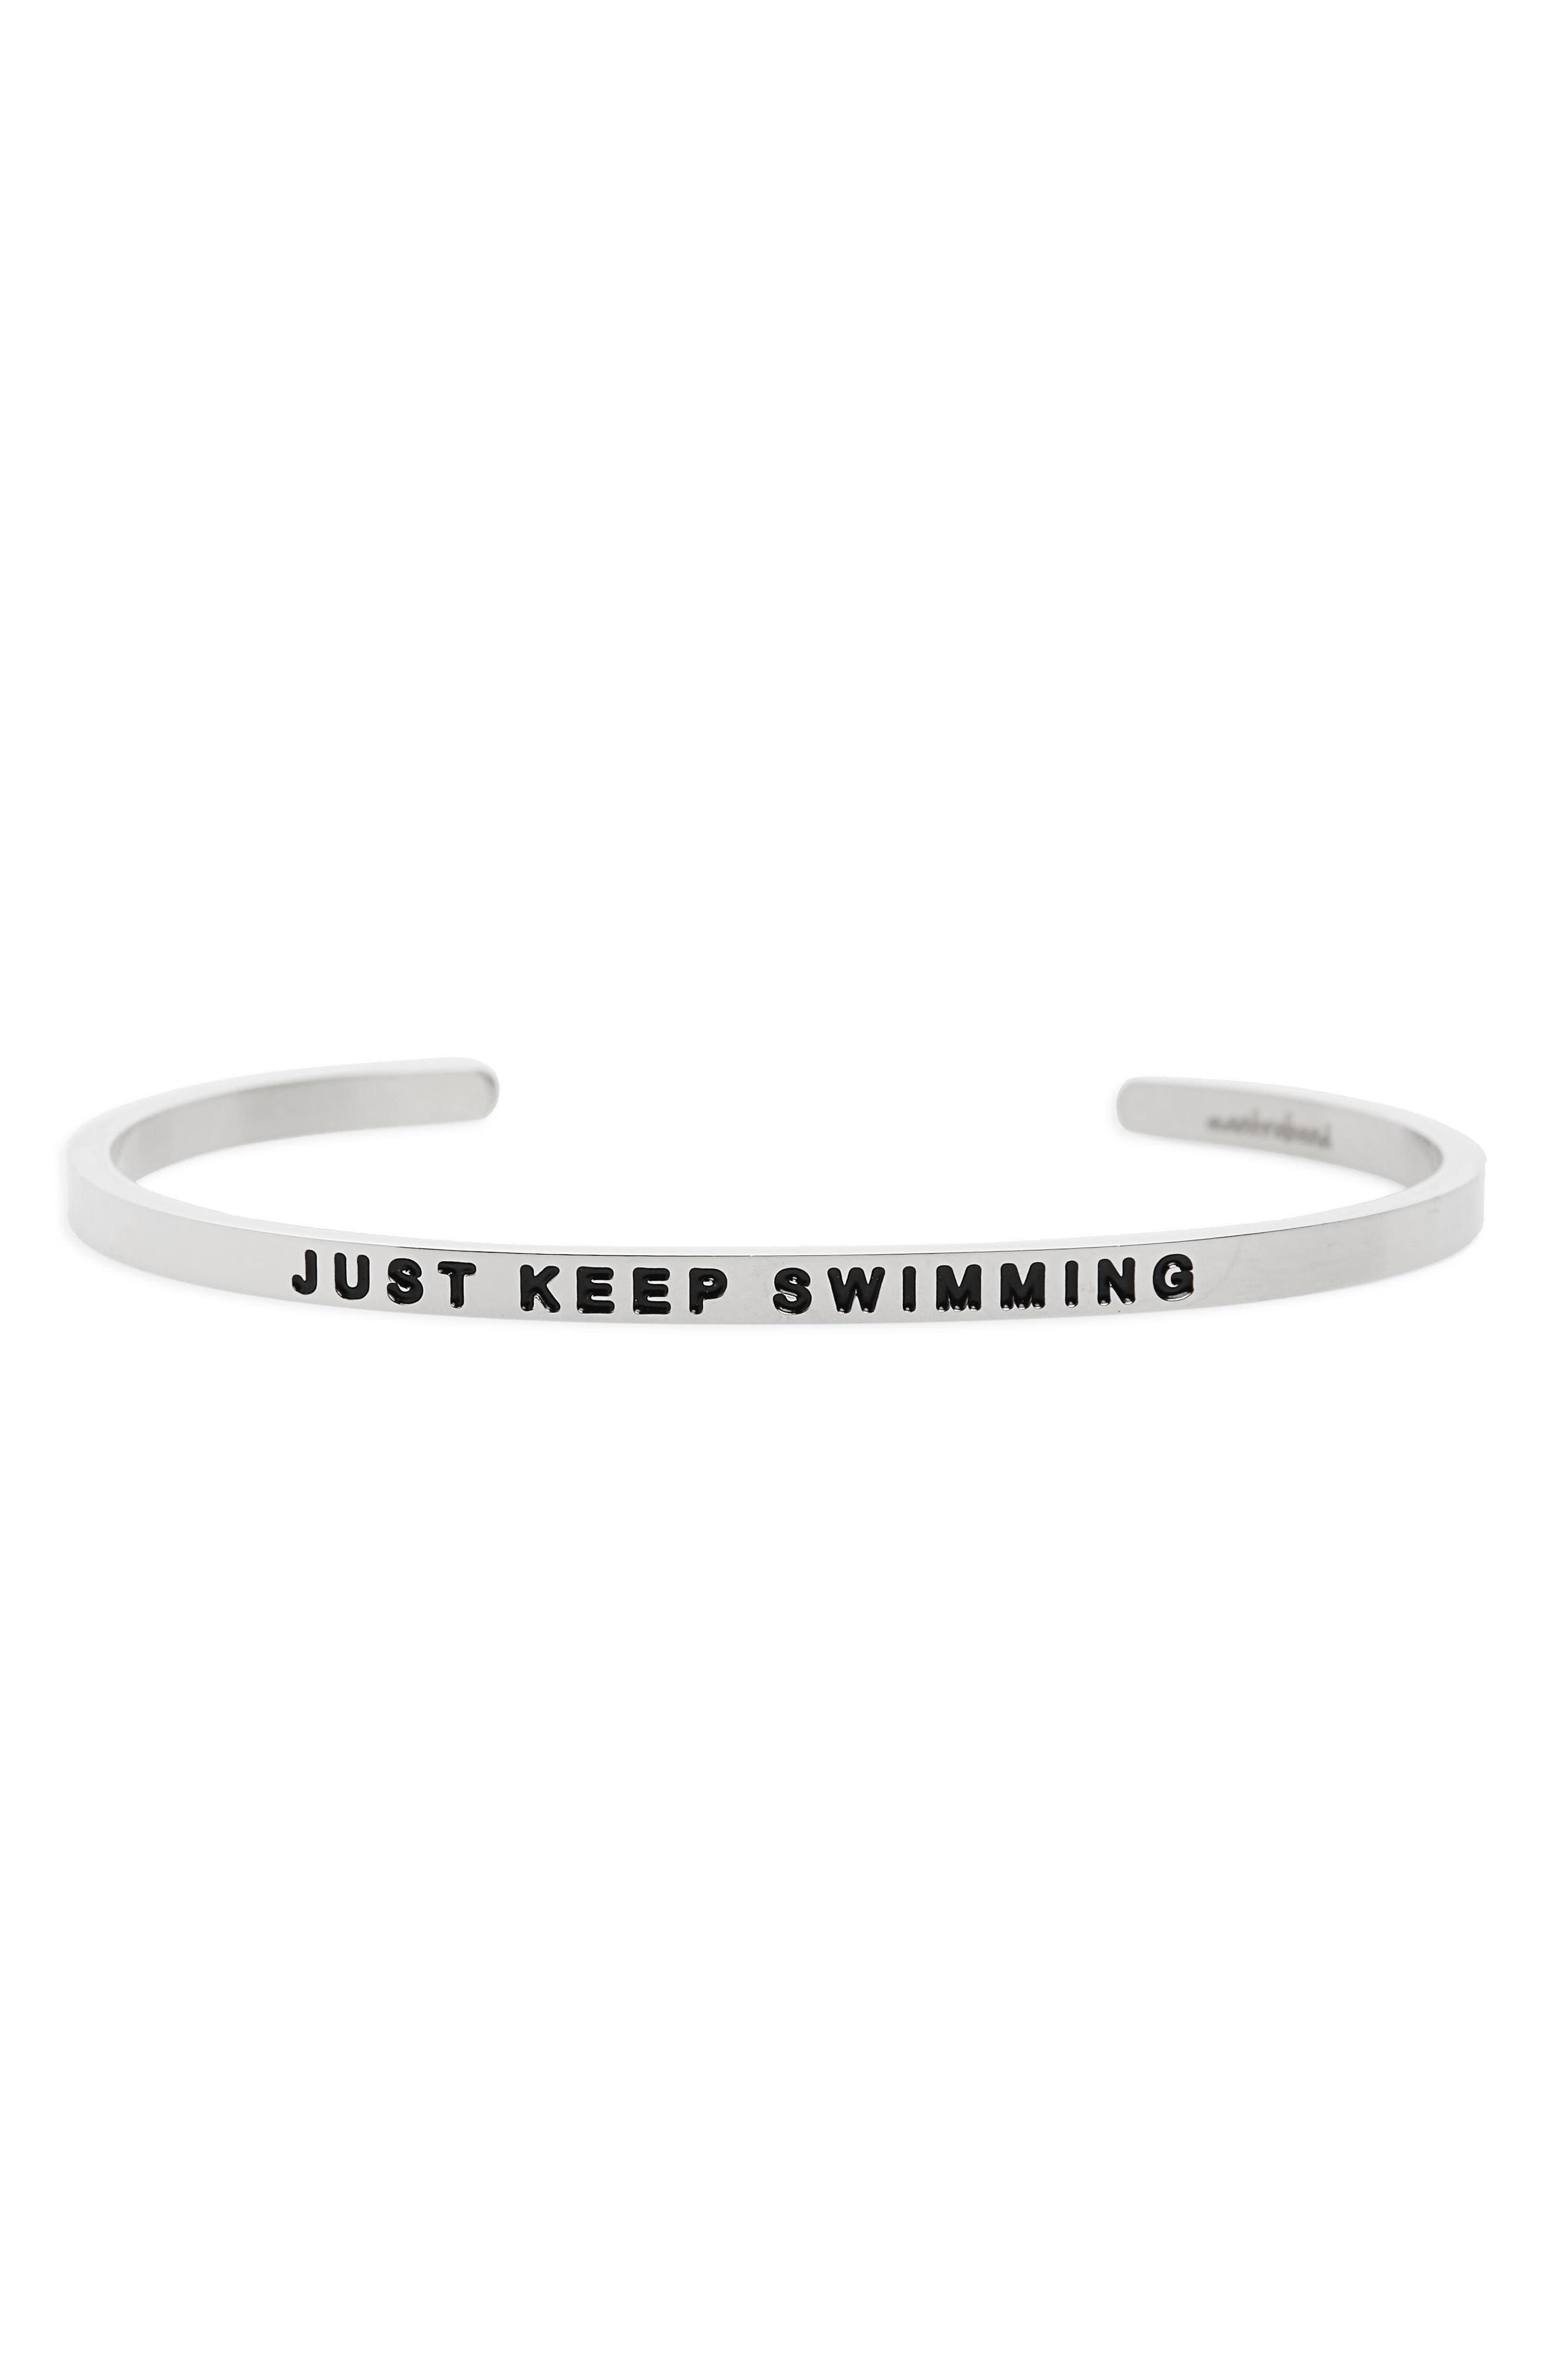 Just Keep Swimming Engraved Cuff,                             Main thumbnail 1, color,